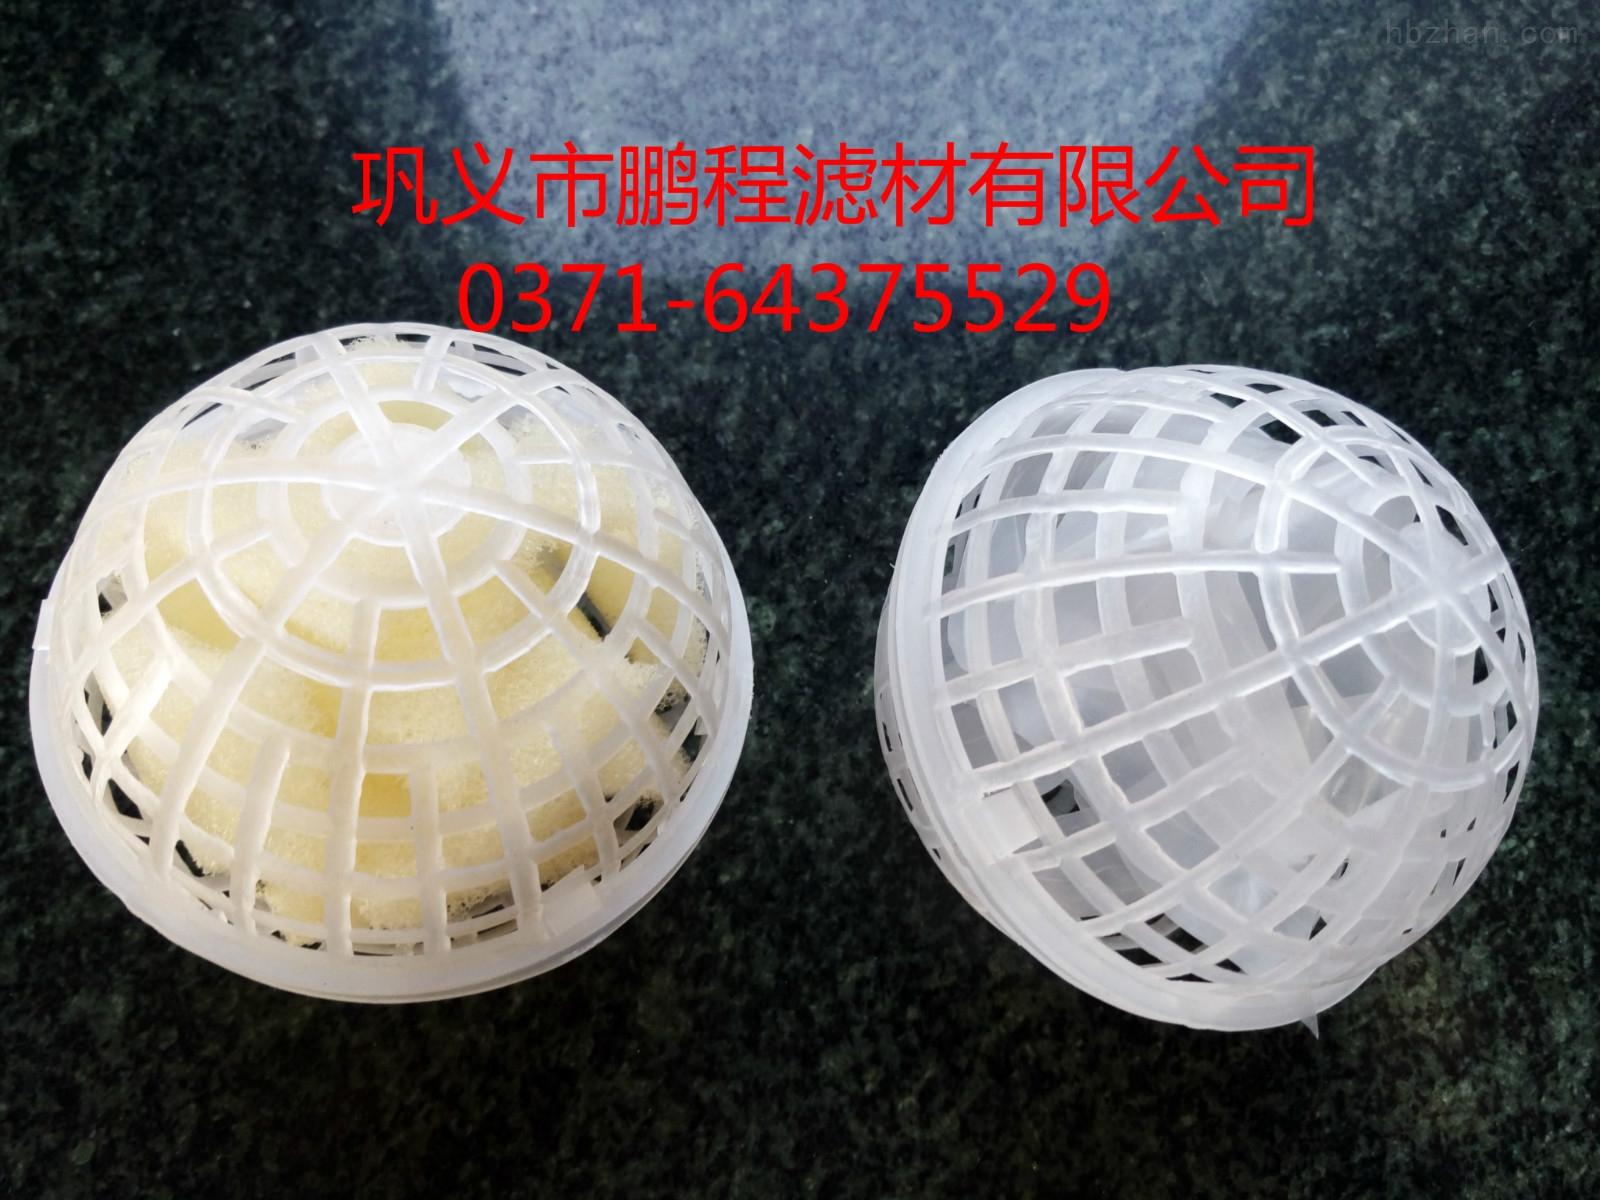 pc1103 山东悬浮球填料生产厂家